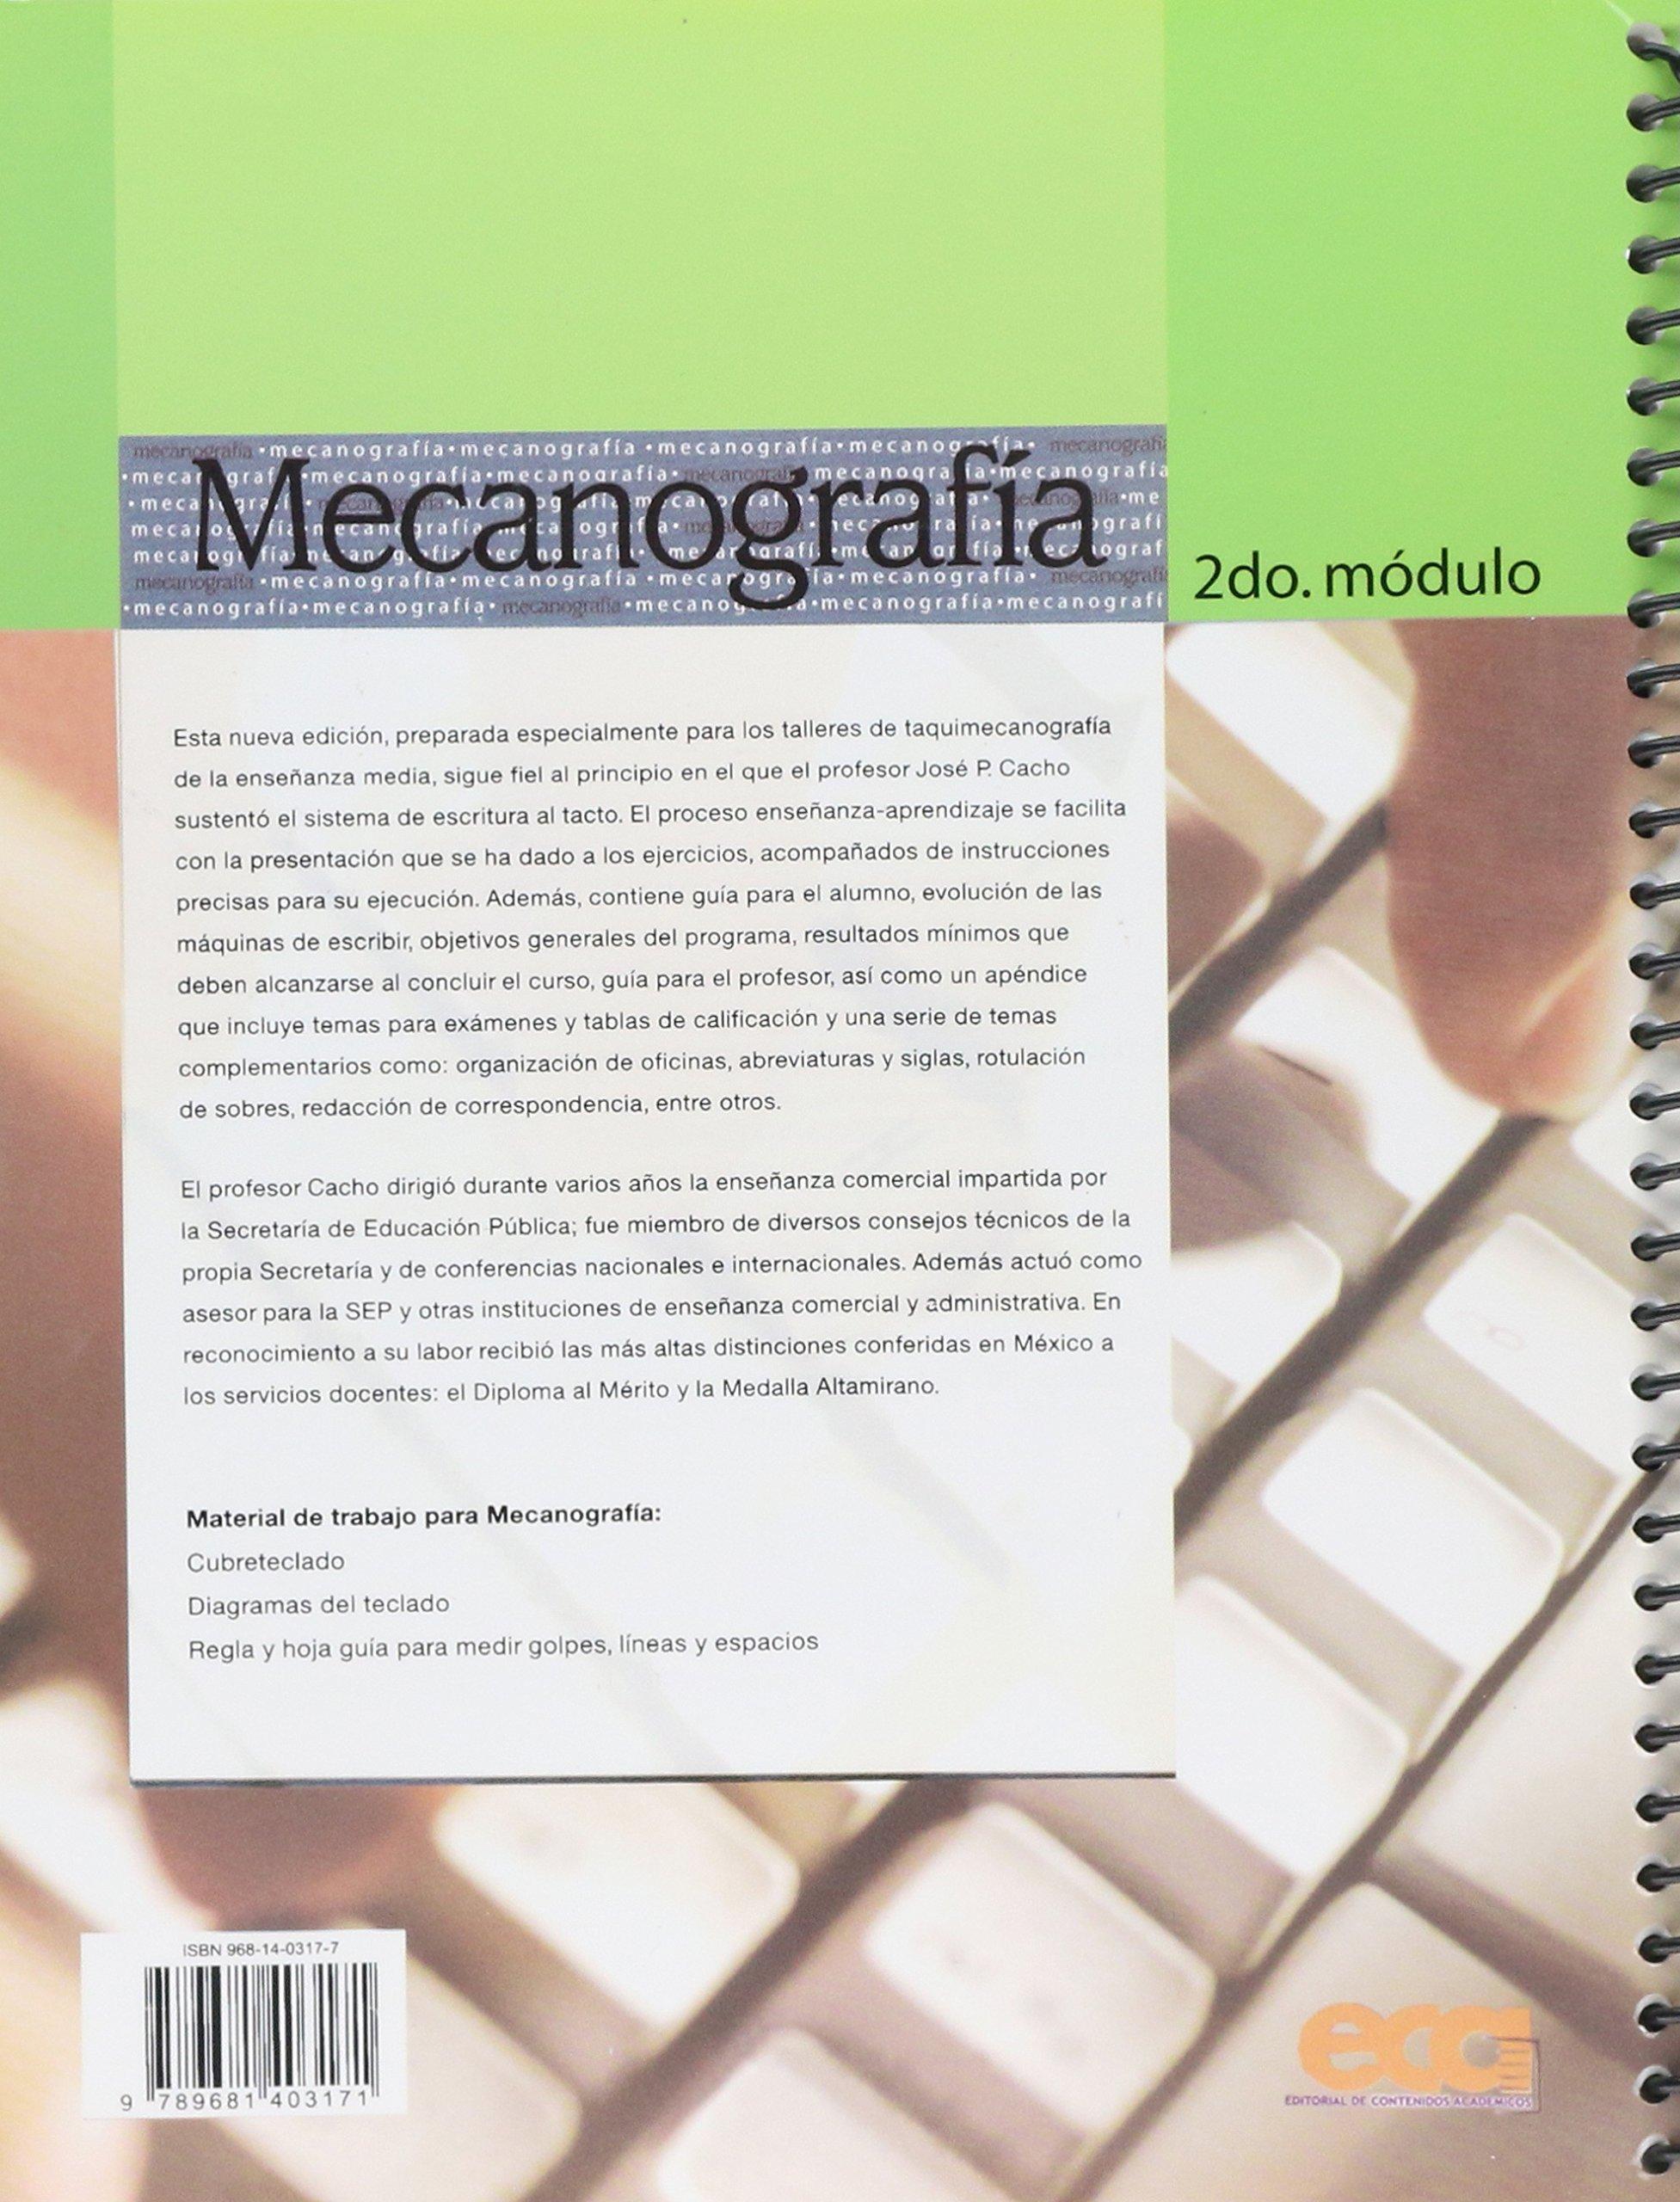 MECANOGRAFIA 2DO MODULO: GRACIA MA. CACHO ROMERO: 9789681403171: Amazon.com: Books